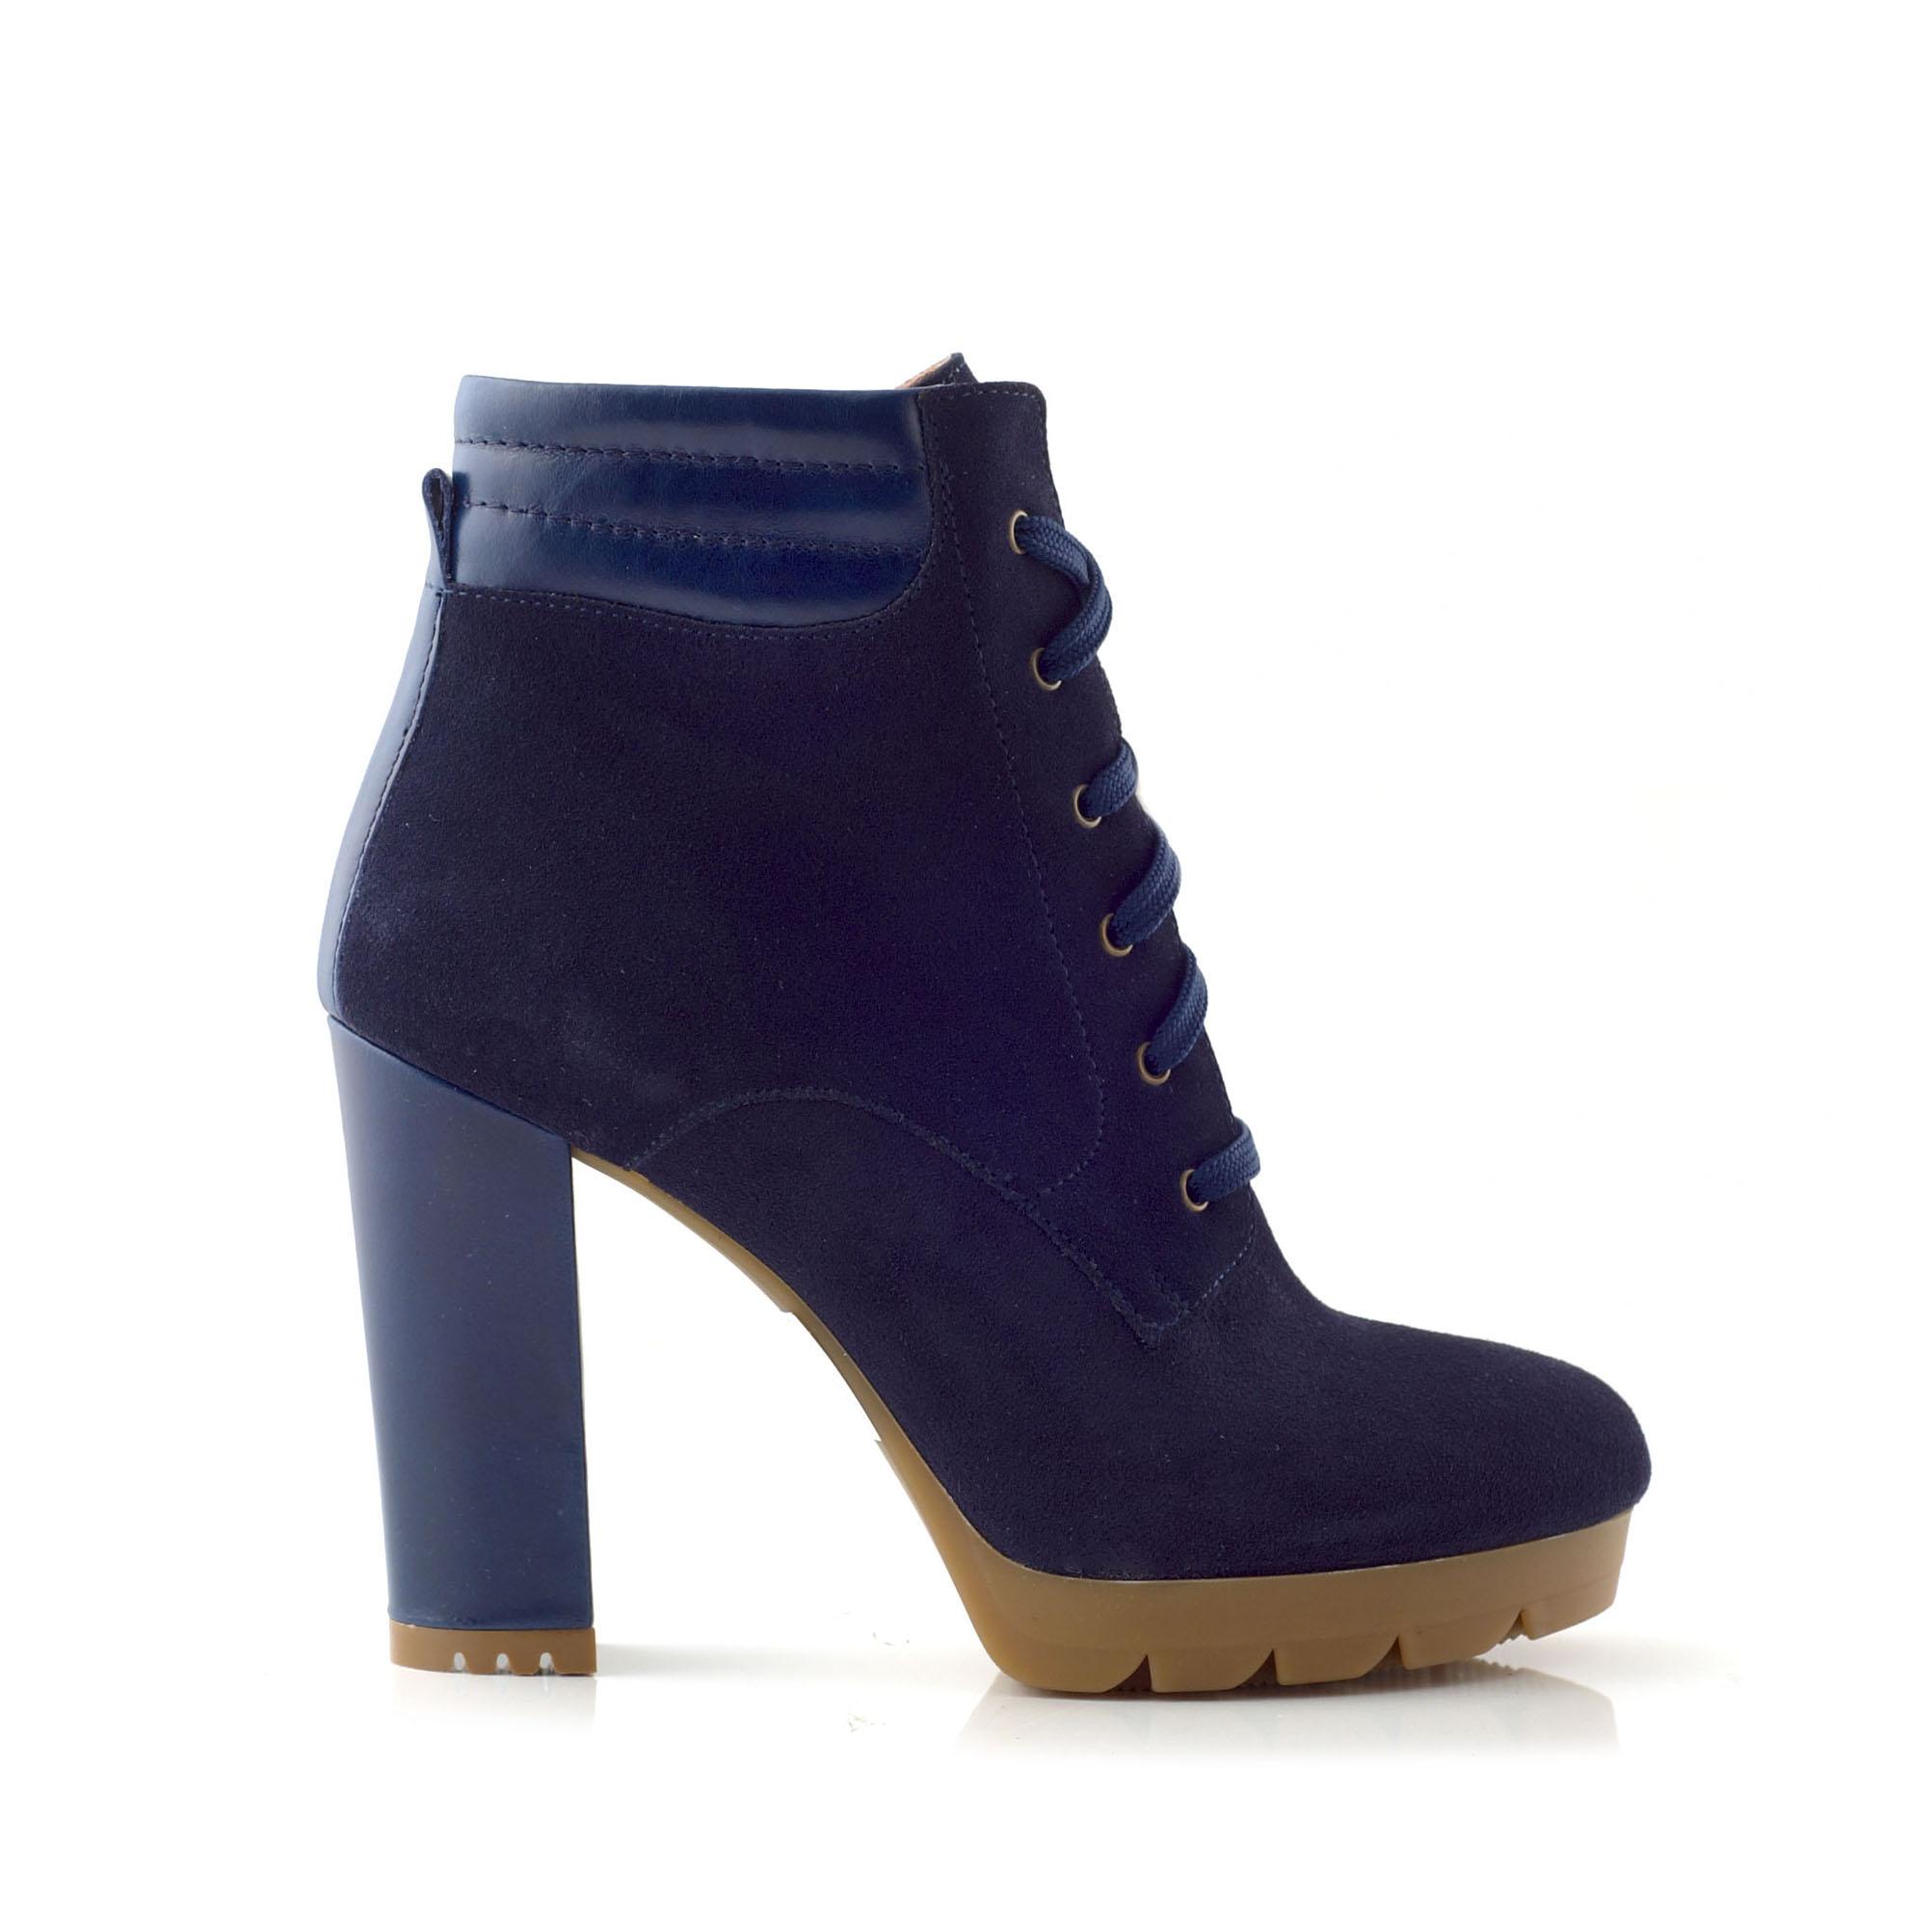 CHANIOTAKIS – Γυναικεία μποτάκια SOFTY μπλε